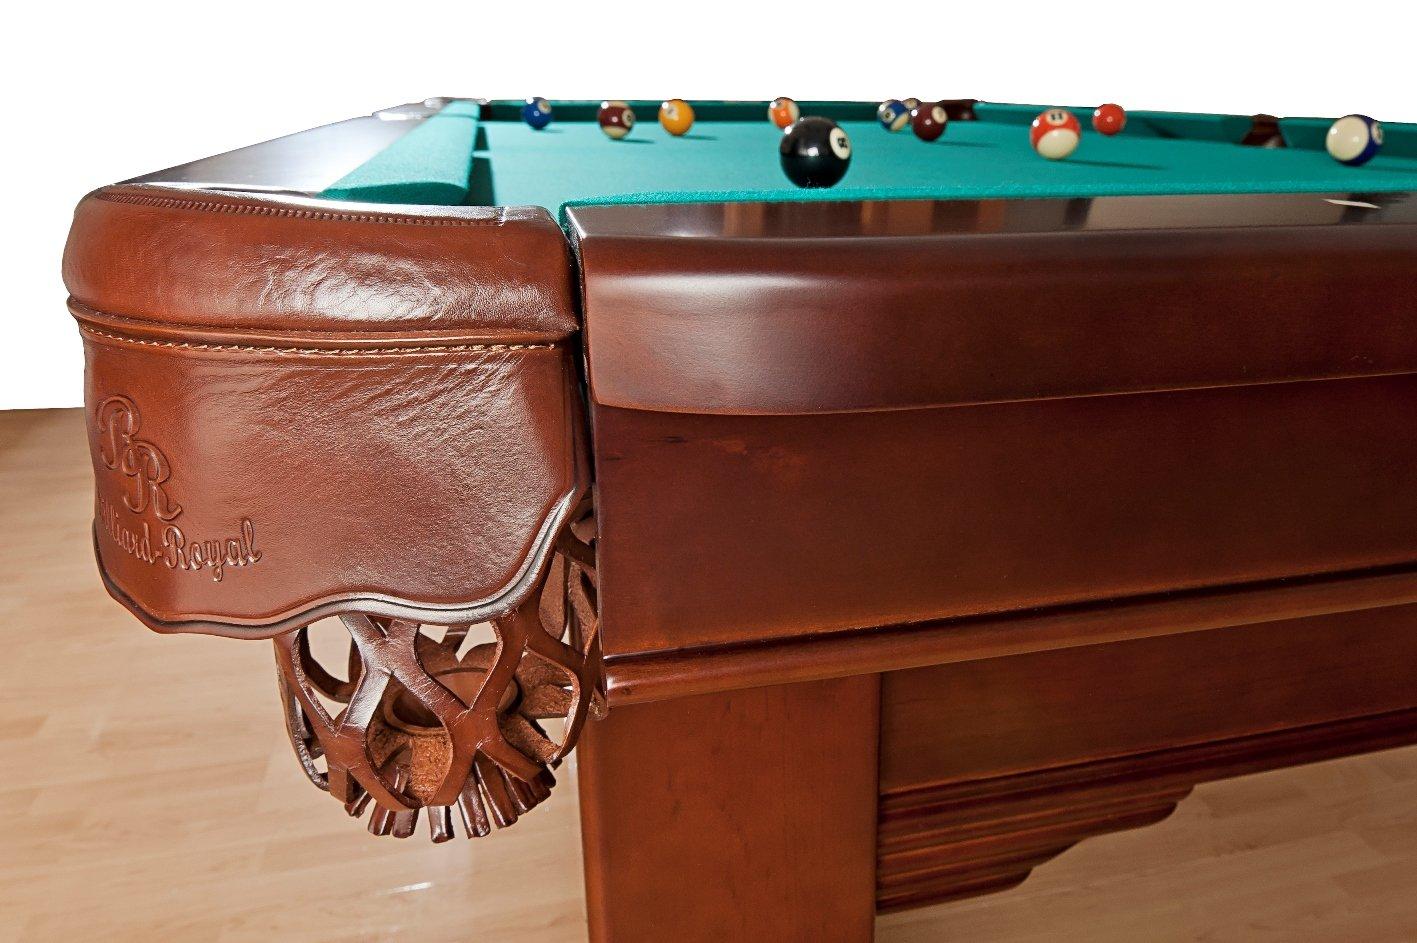 Billiard-Royal Mesa de Billar Modelo Magdalena – 9 Ft, Verde ...